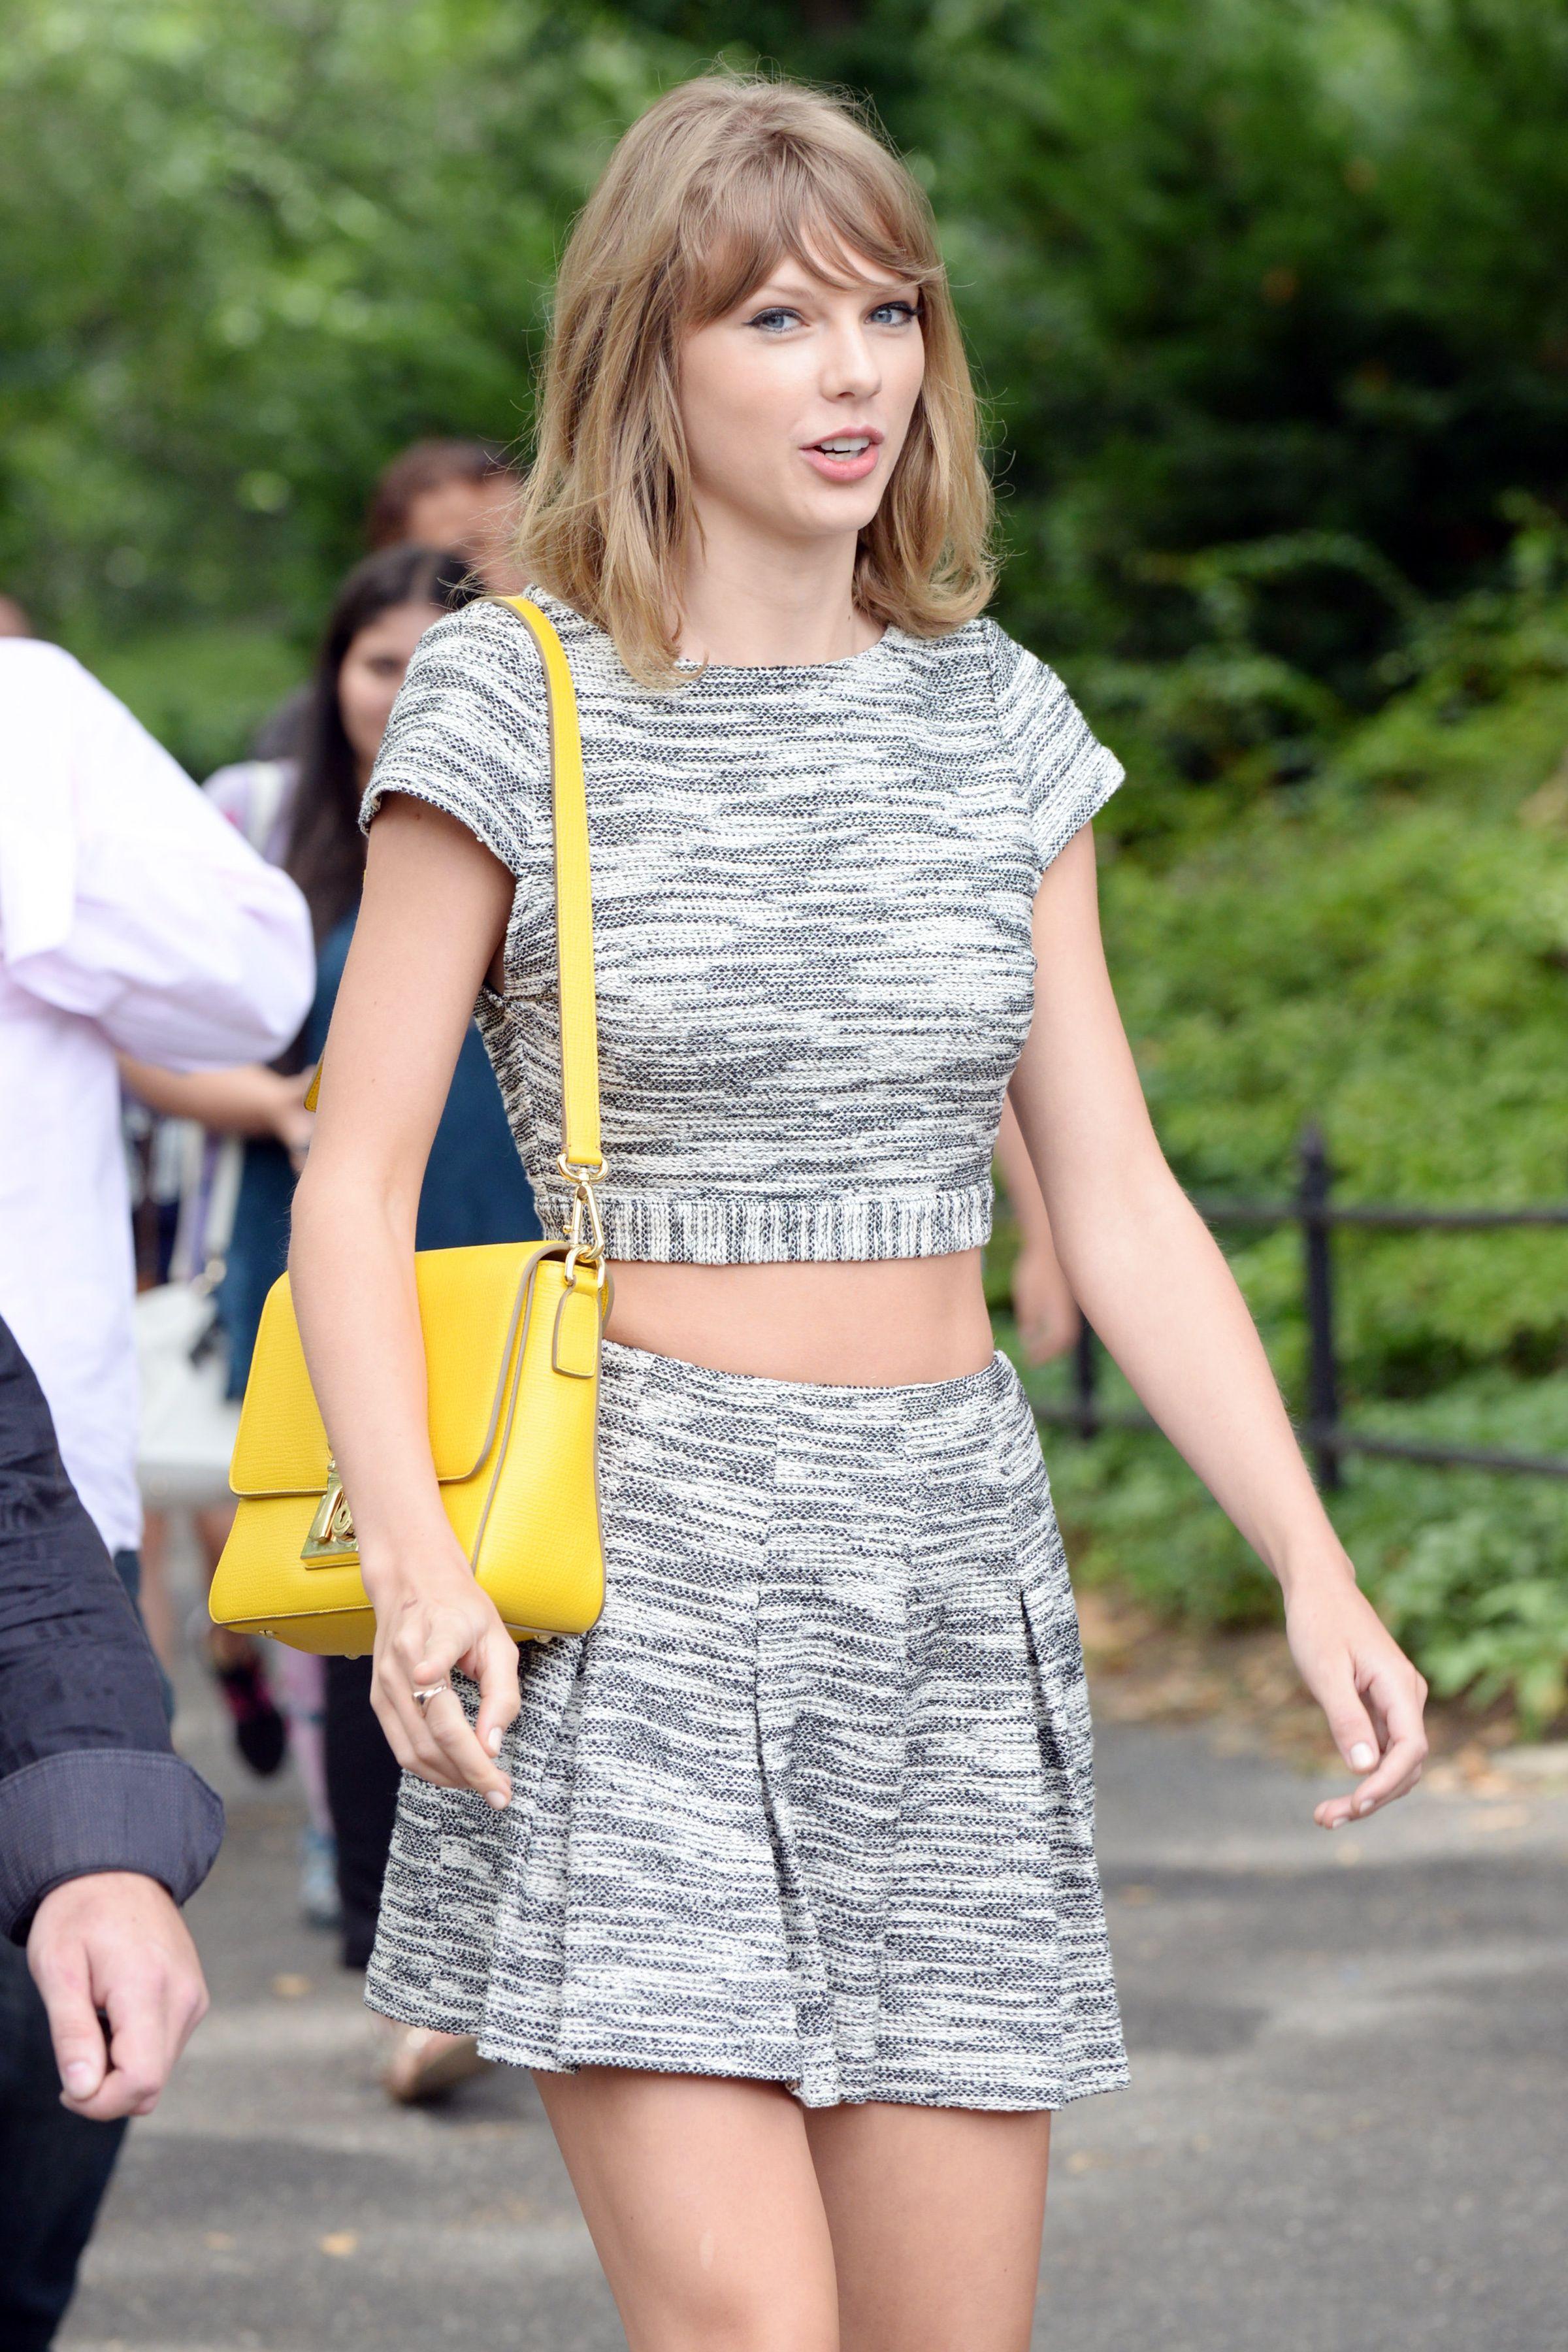 Taylor Swift S Skinny Diet Secrets Photos She Loves Chia Seeds Eats Like A Bird Radar Onl Taylor Swift Skinny Taylor Swift Street Style Taylor Swift Hot